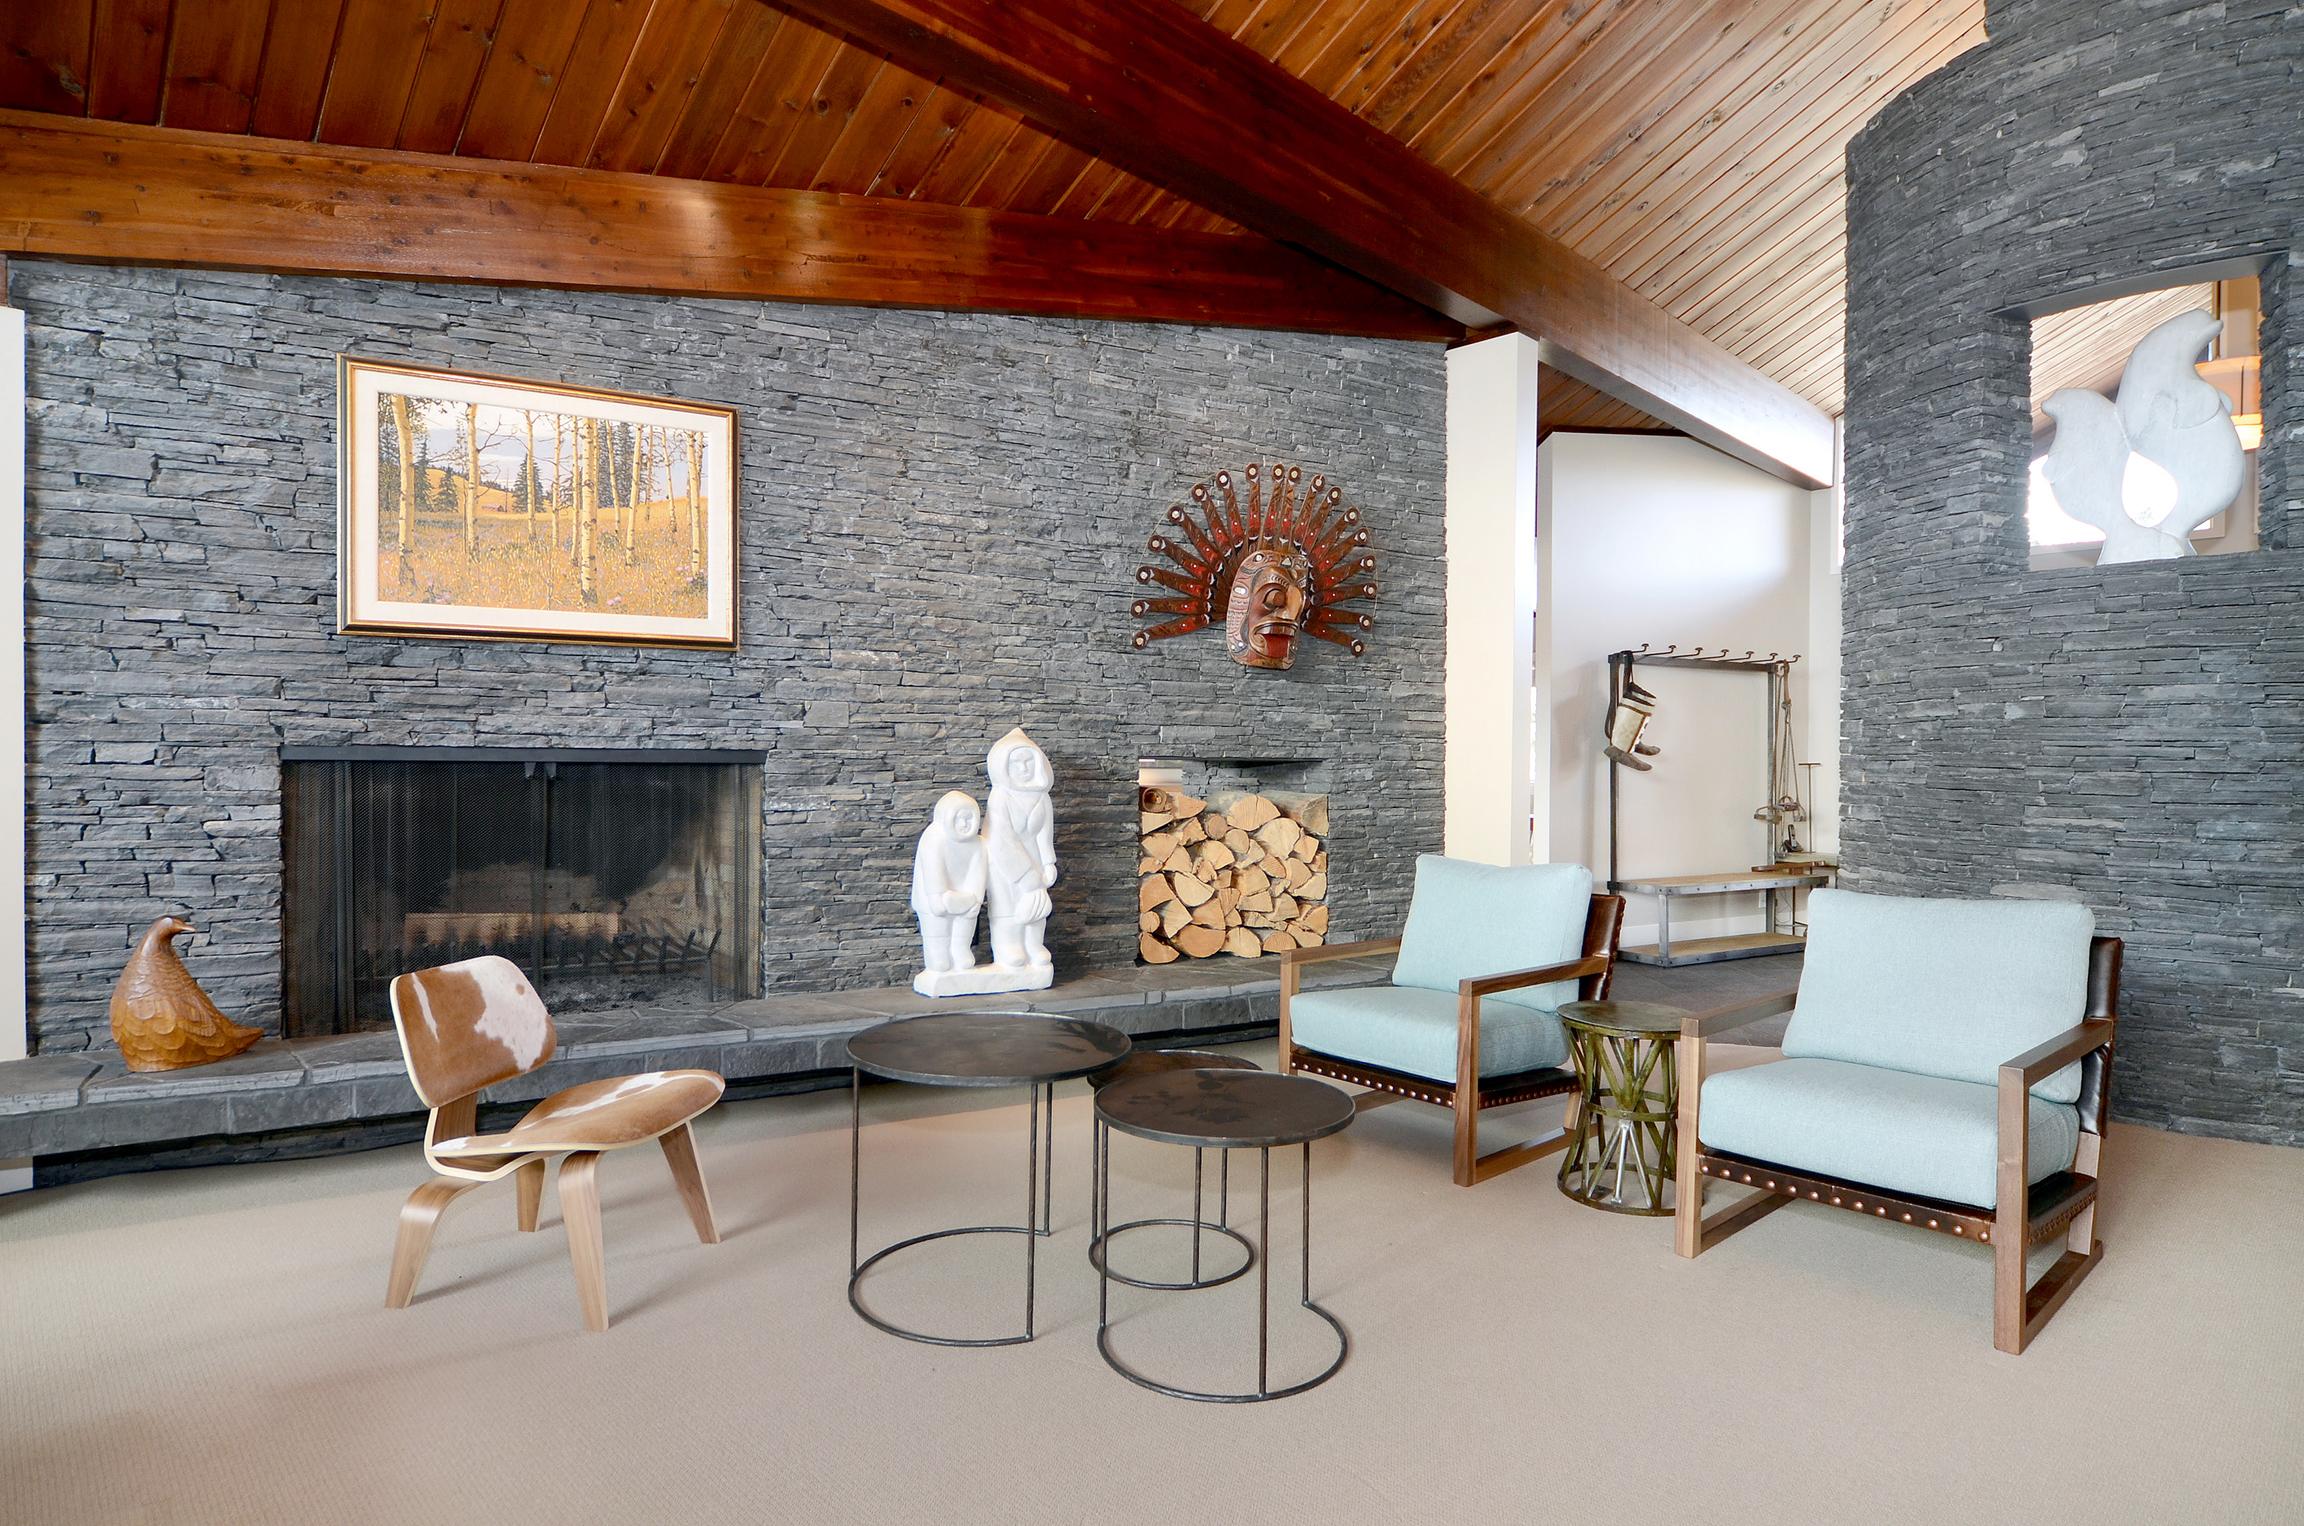 DESIGN MILK: Contemporary Ranch Feature